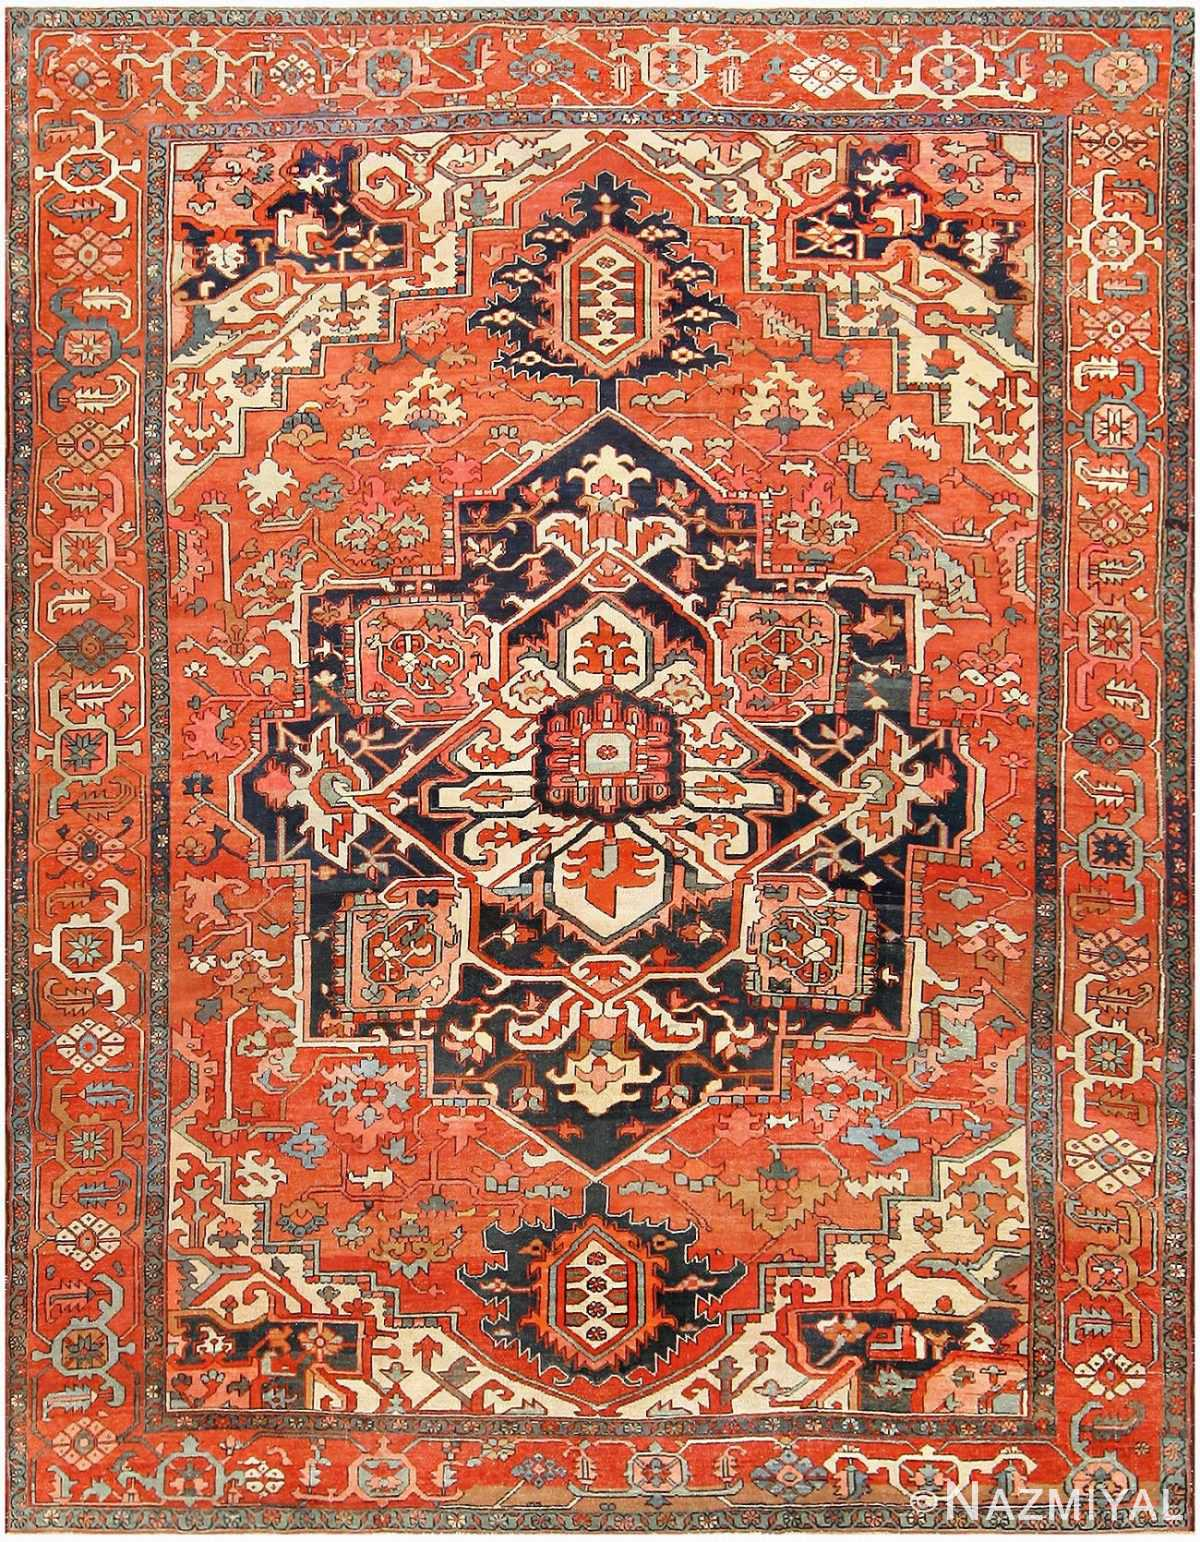 Antique Persian Serapi Rug 48241 Detail/Large View